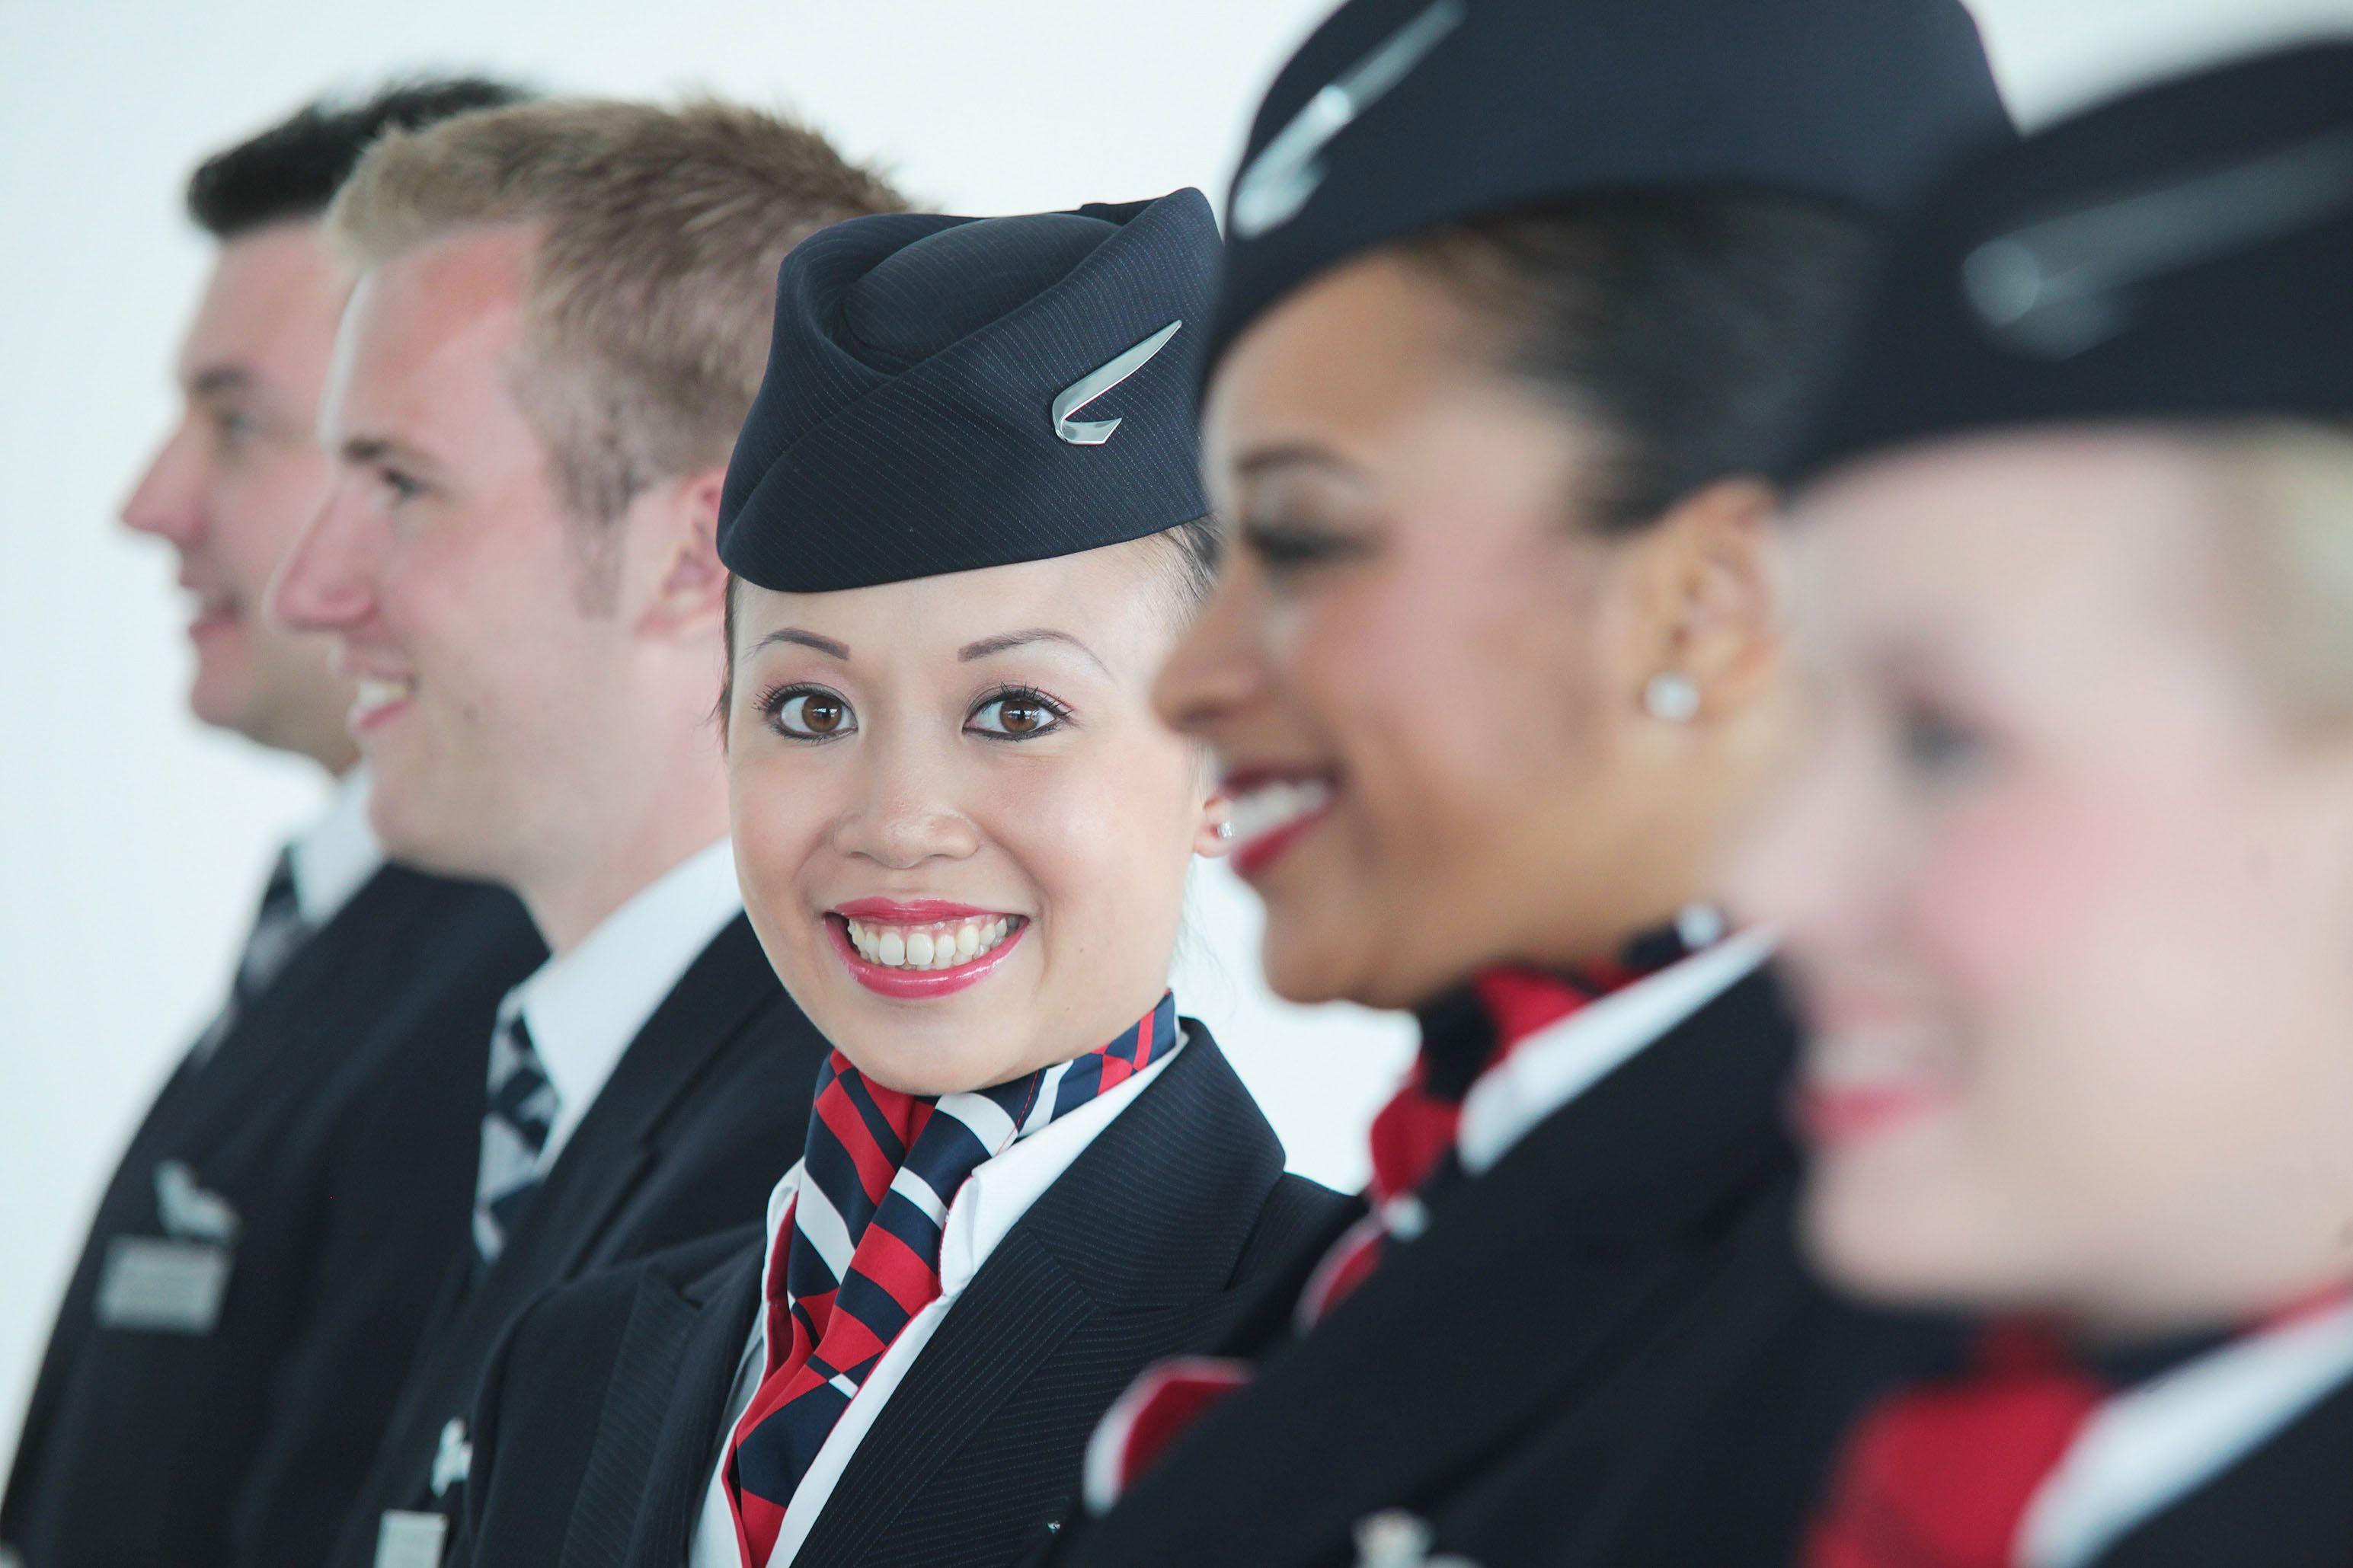 British Airways travel alookat airlines 制帽, 客室乗務員